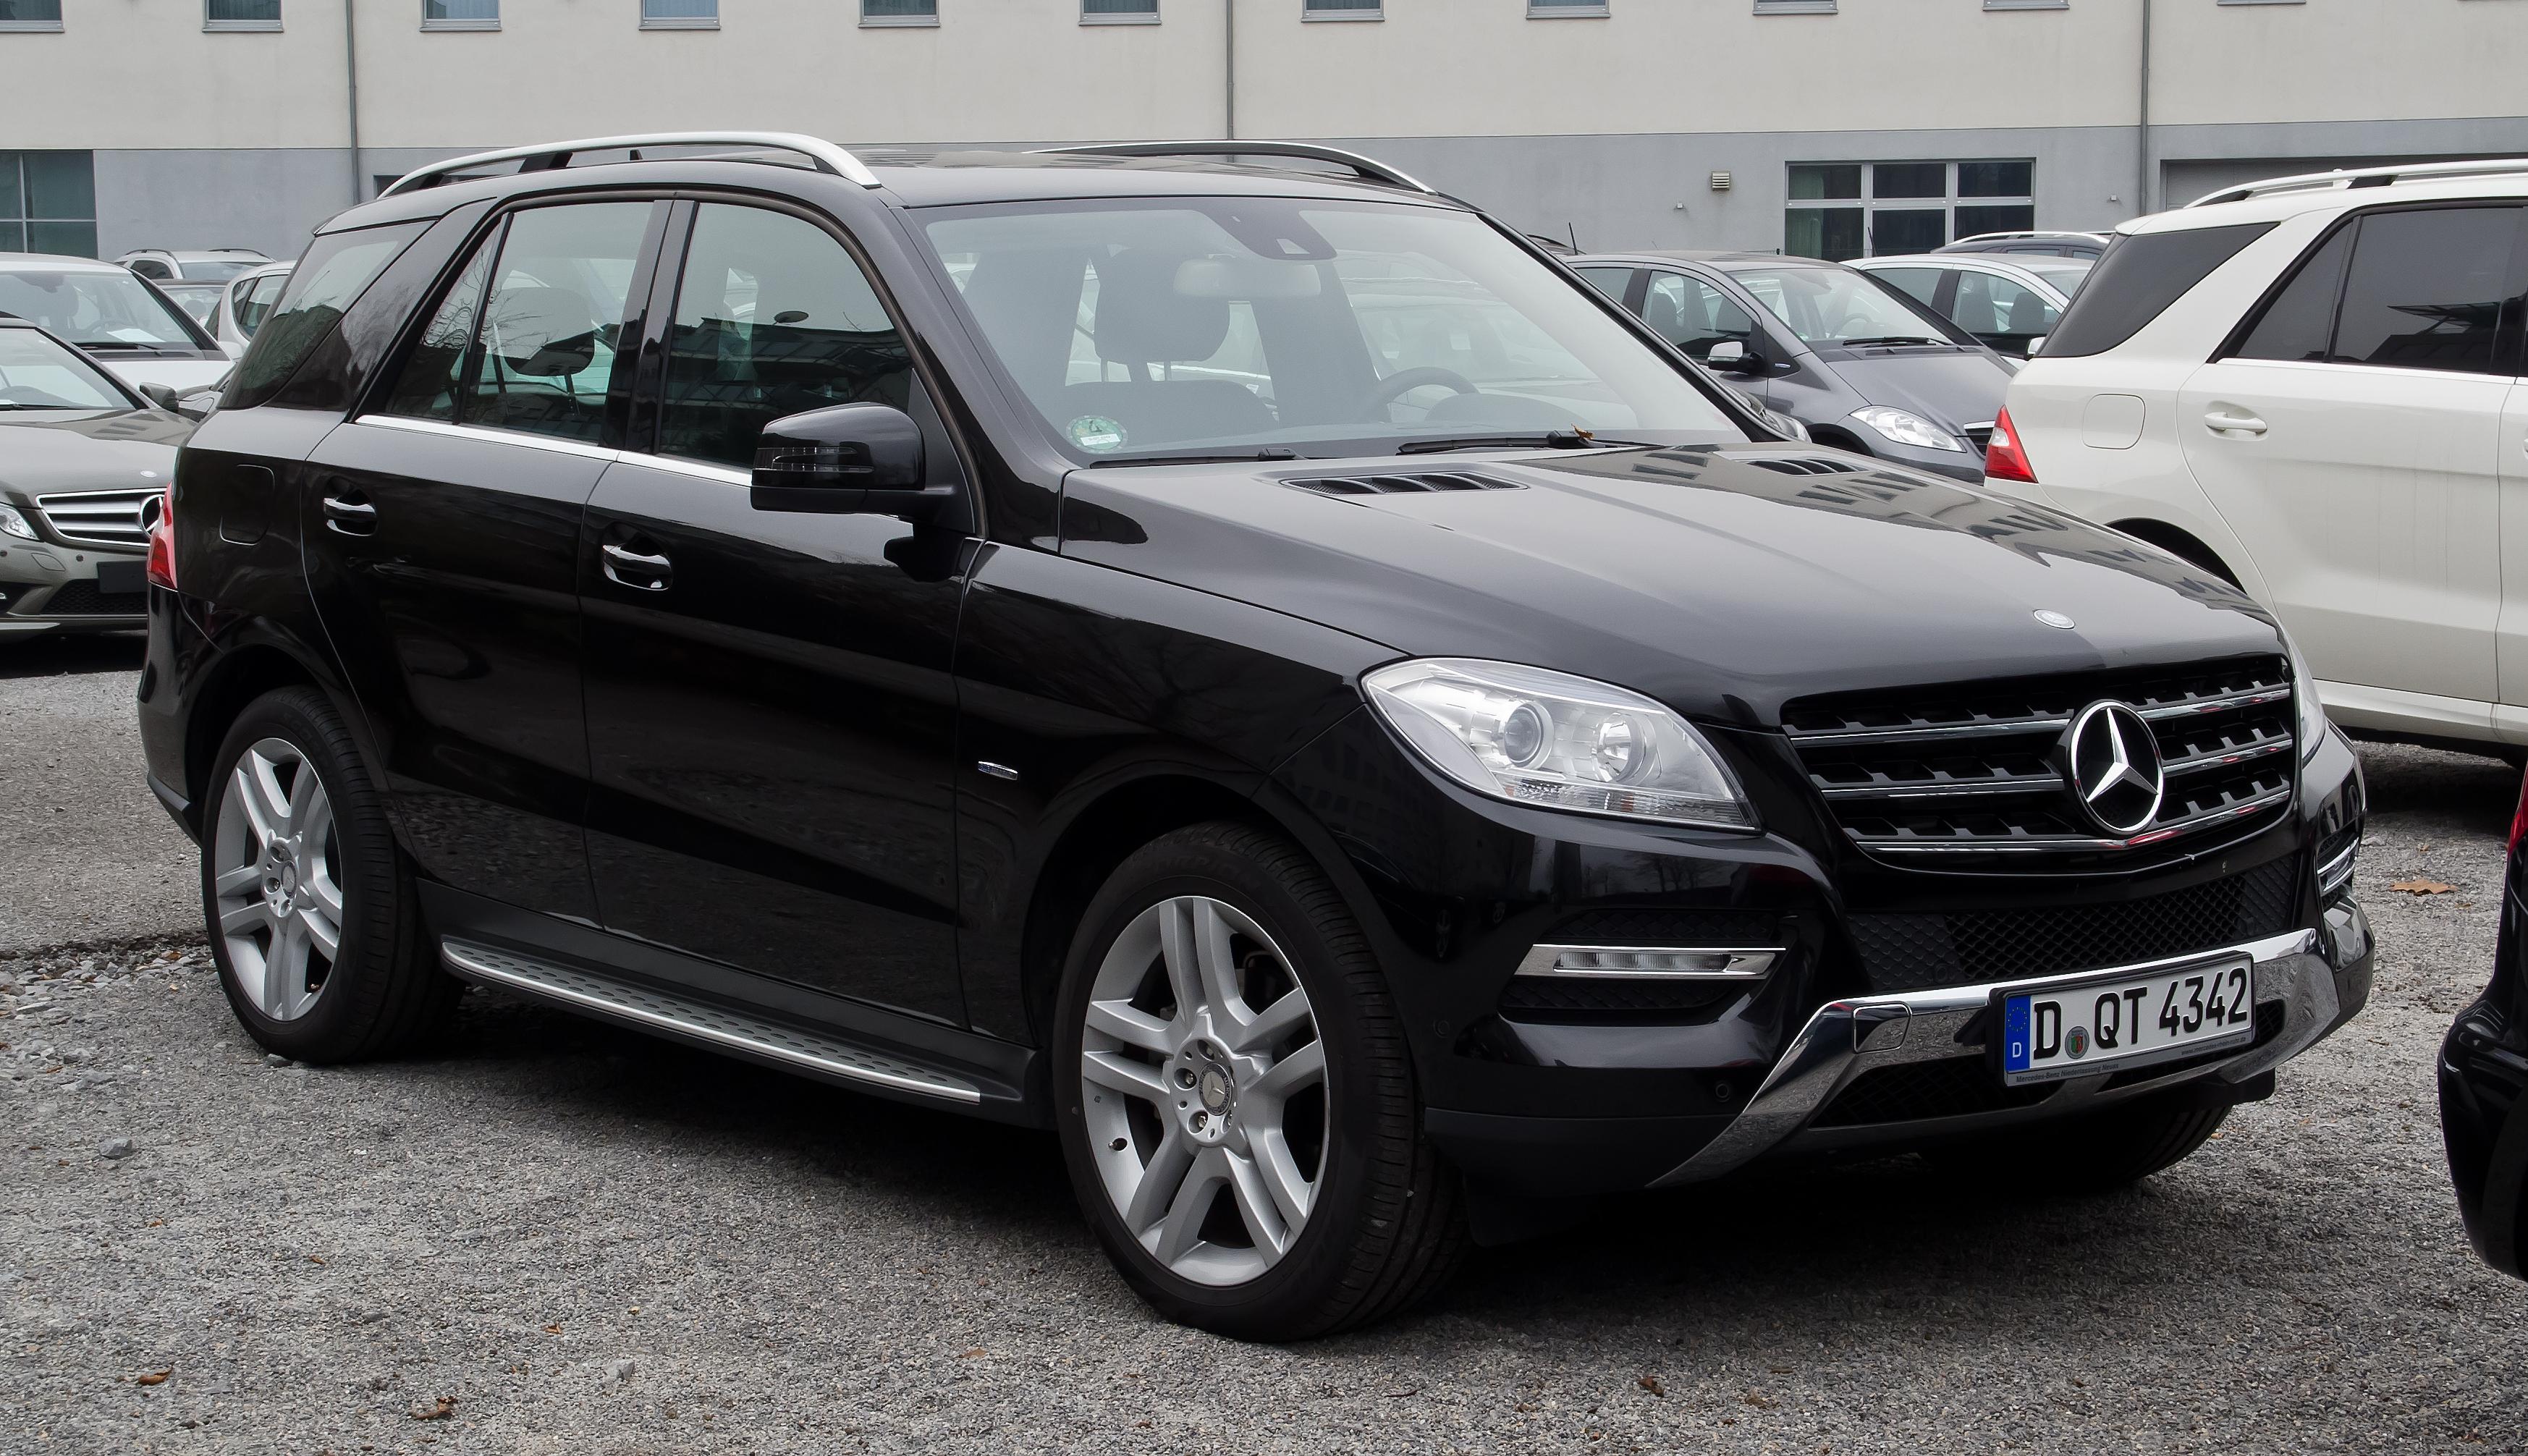 Mercedes Benz Ml350 History >> File Mercedes Benz Ml 350 Bluetec W 166 Frontansicht 17 Marz